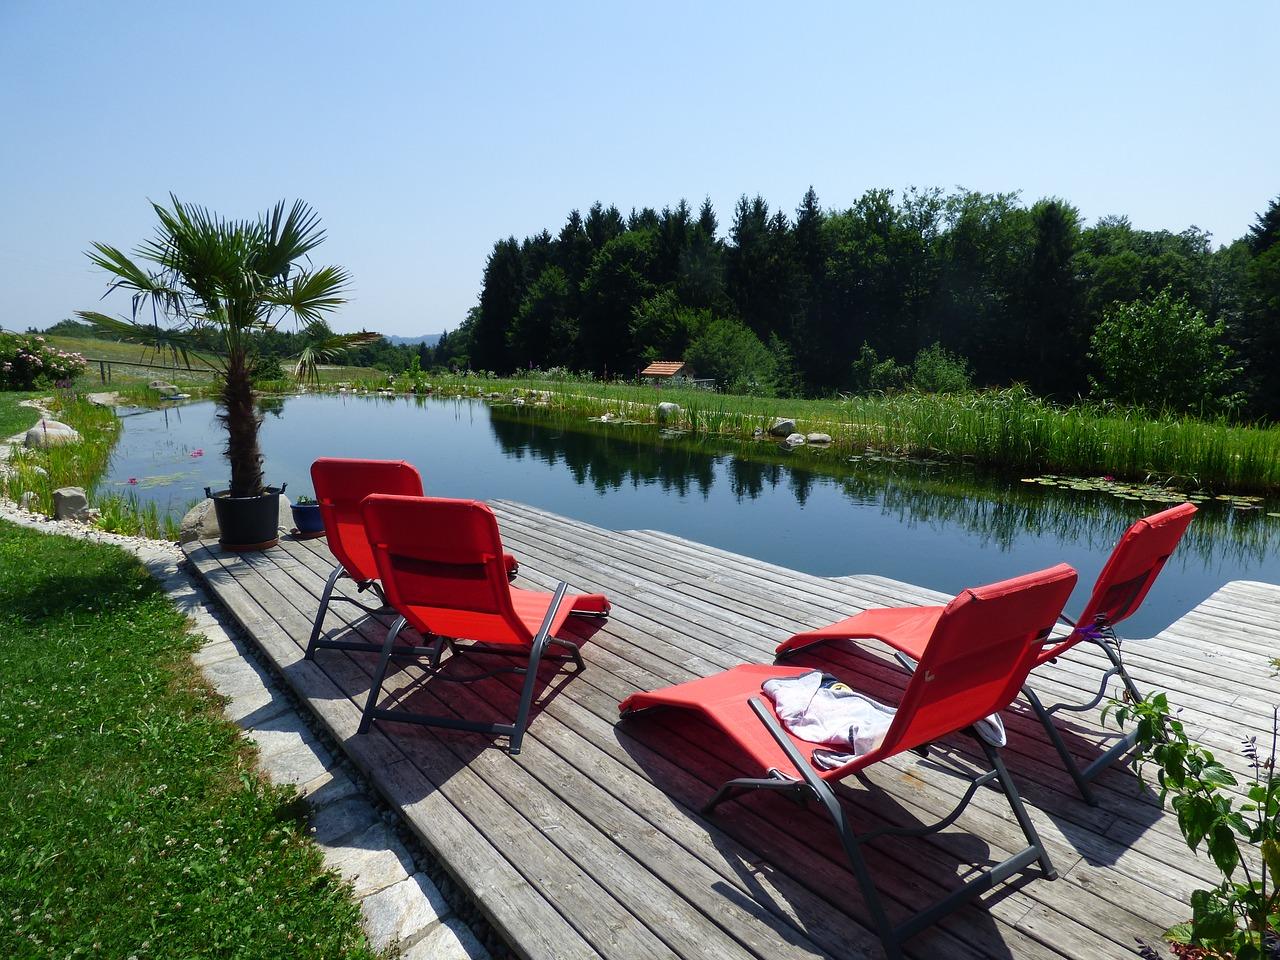 Gartenmöbel als Sitzgelegenheit